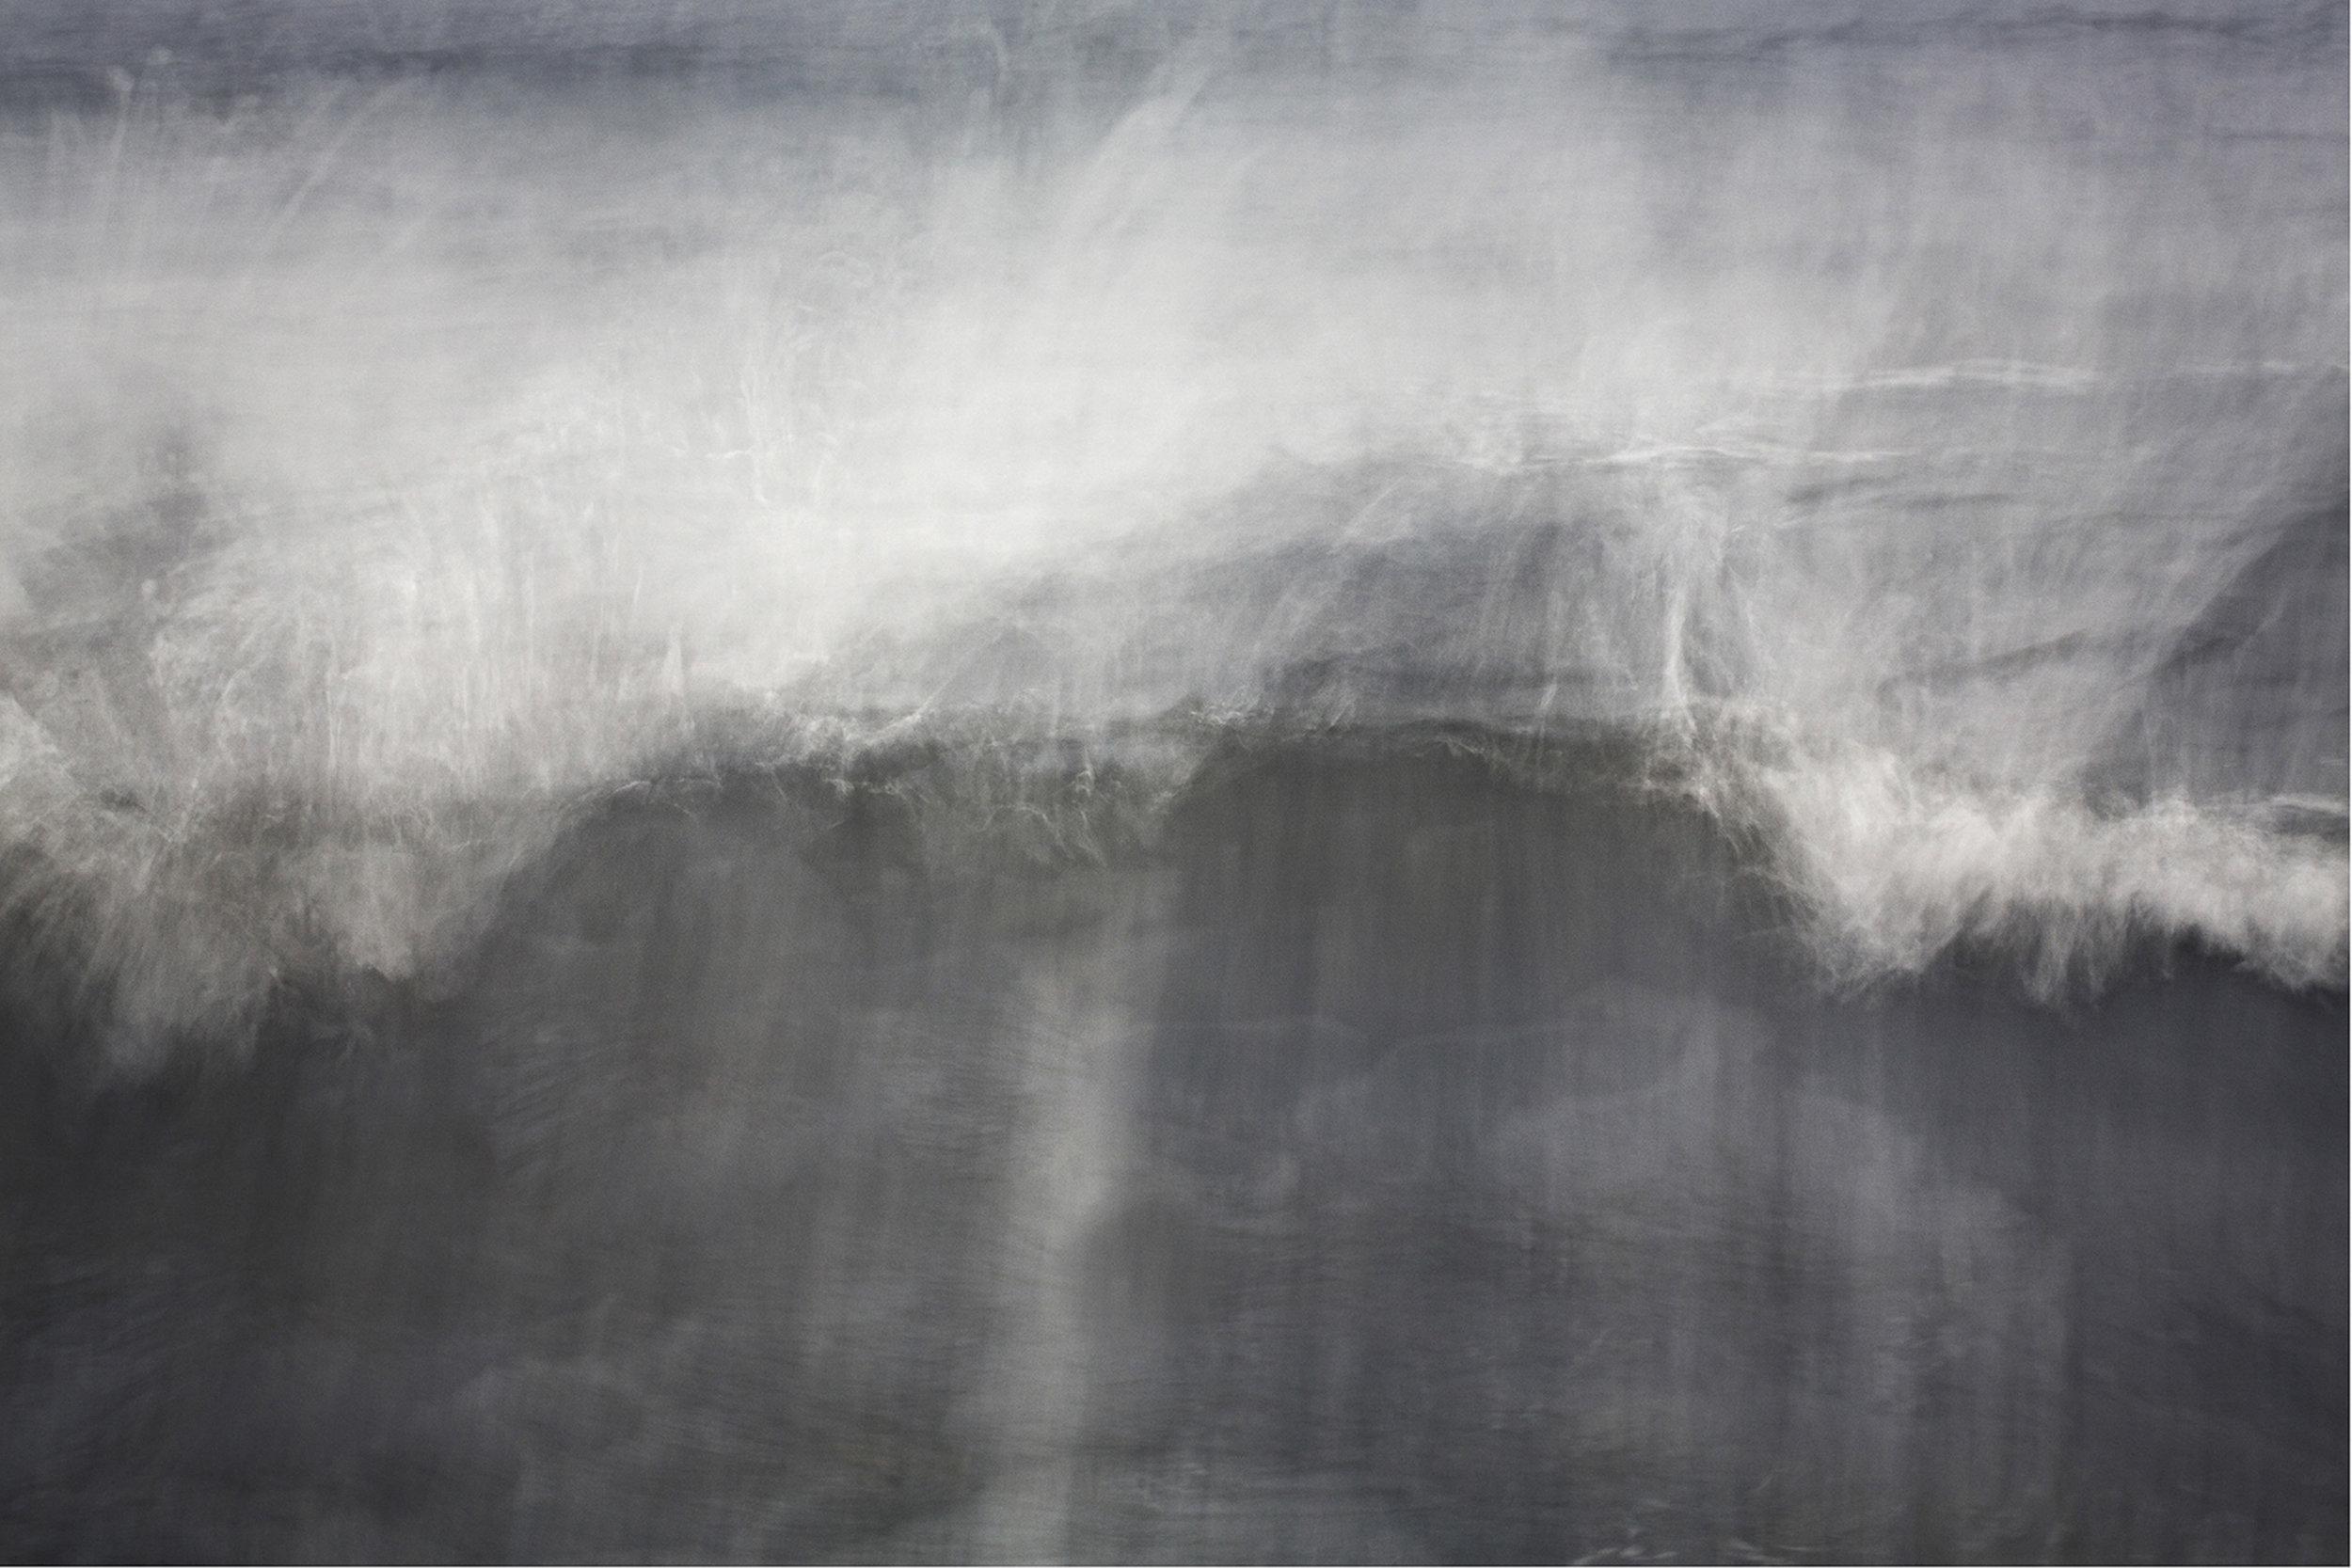 Fotografi, _Skagerak_, 2013, Fine Art Print, 68,5x104 cm, edition 6.JPG